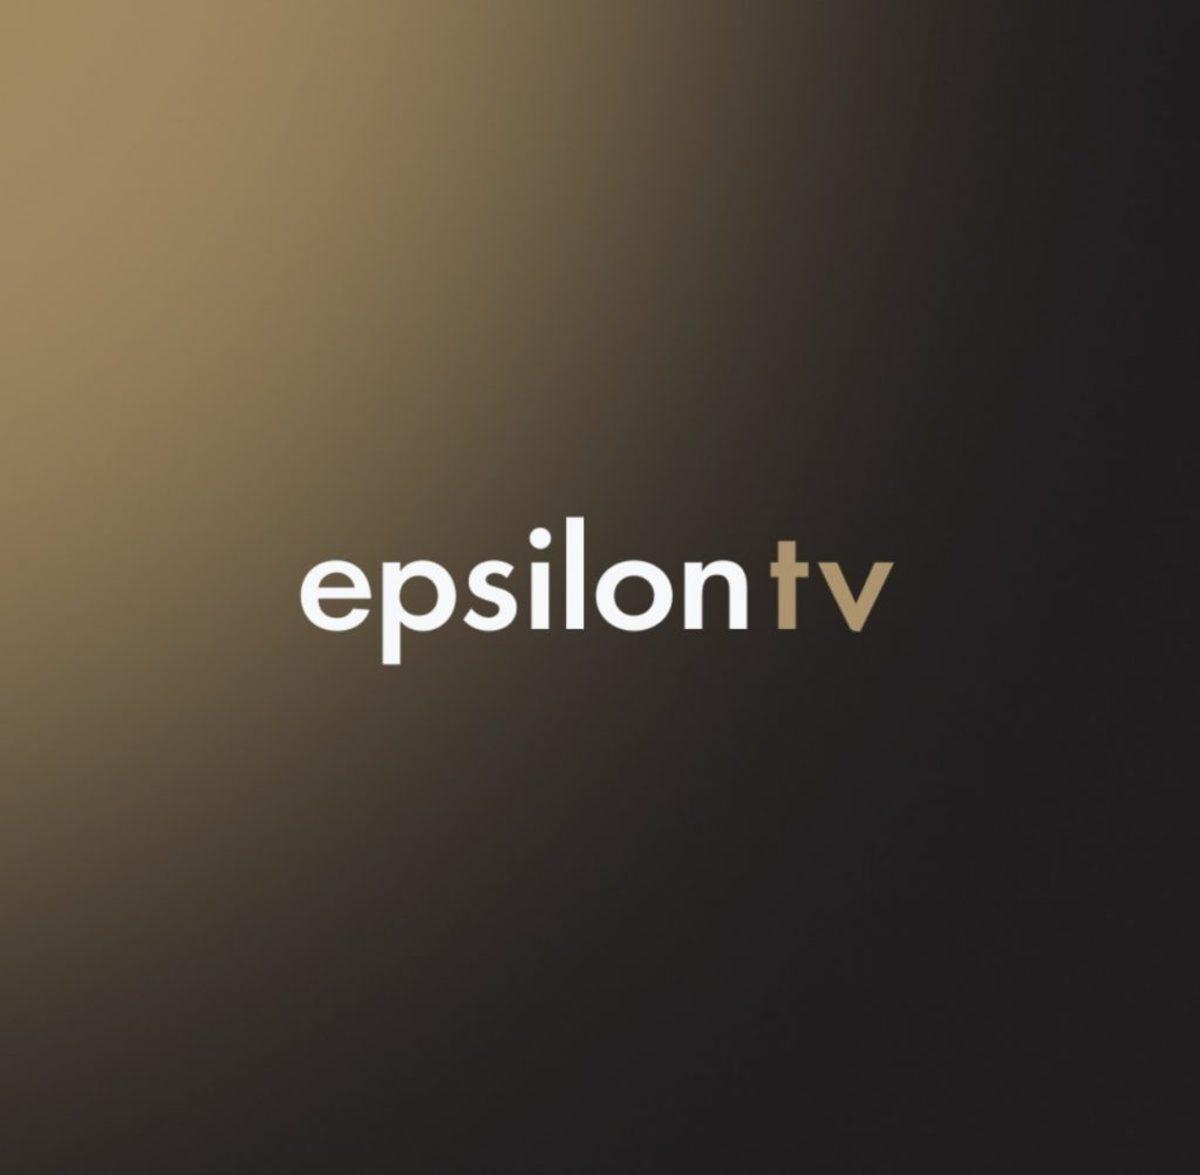 Epsilon όνομα